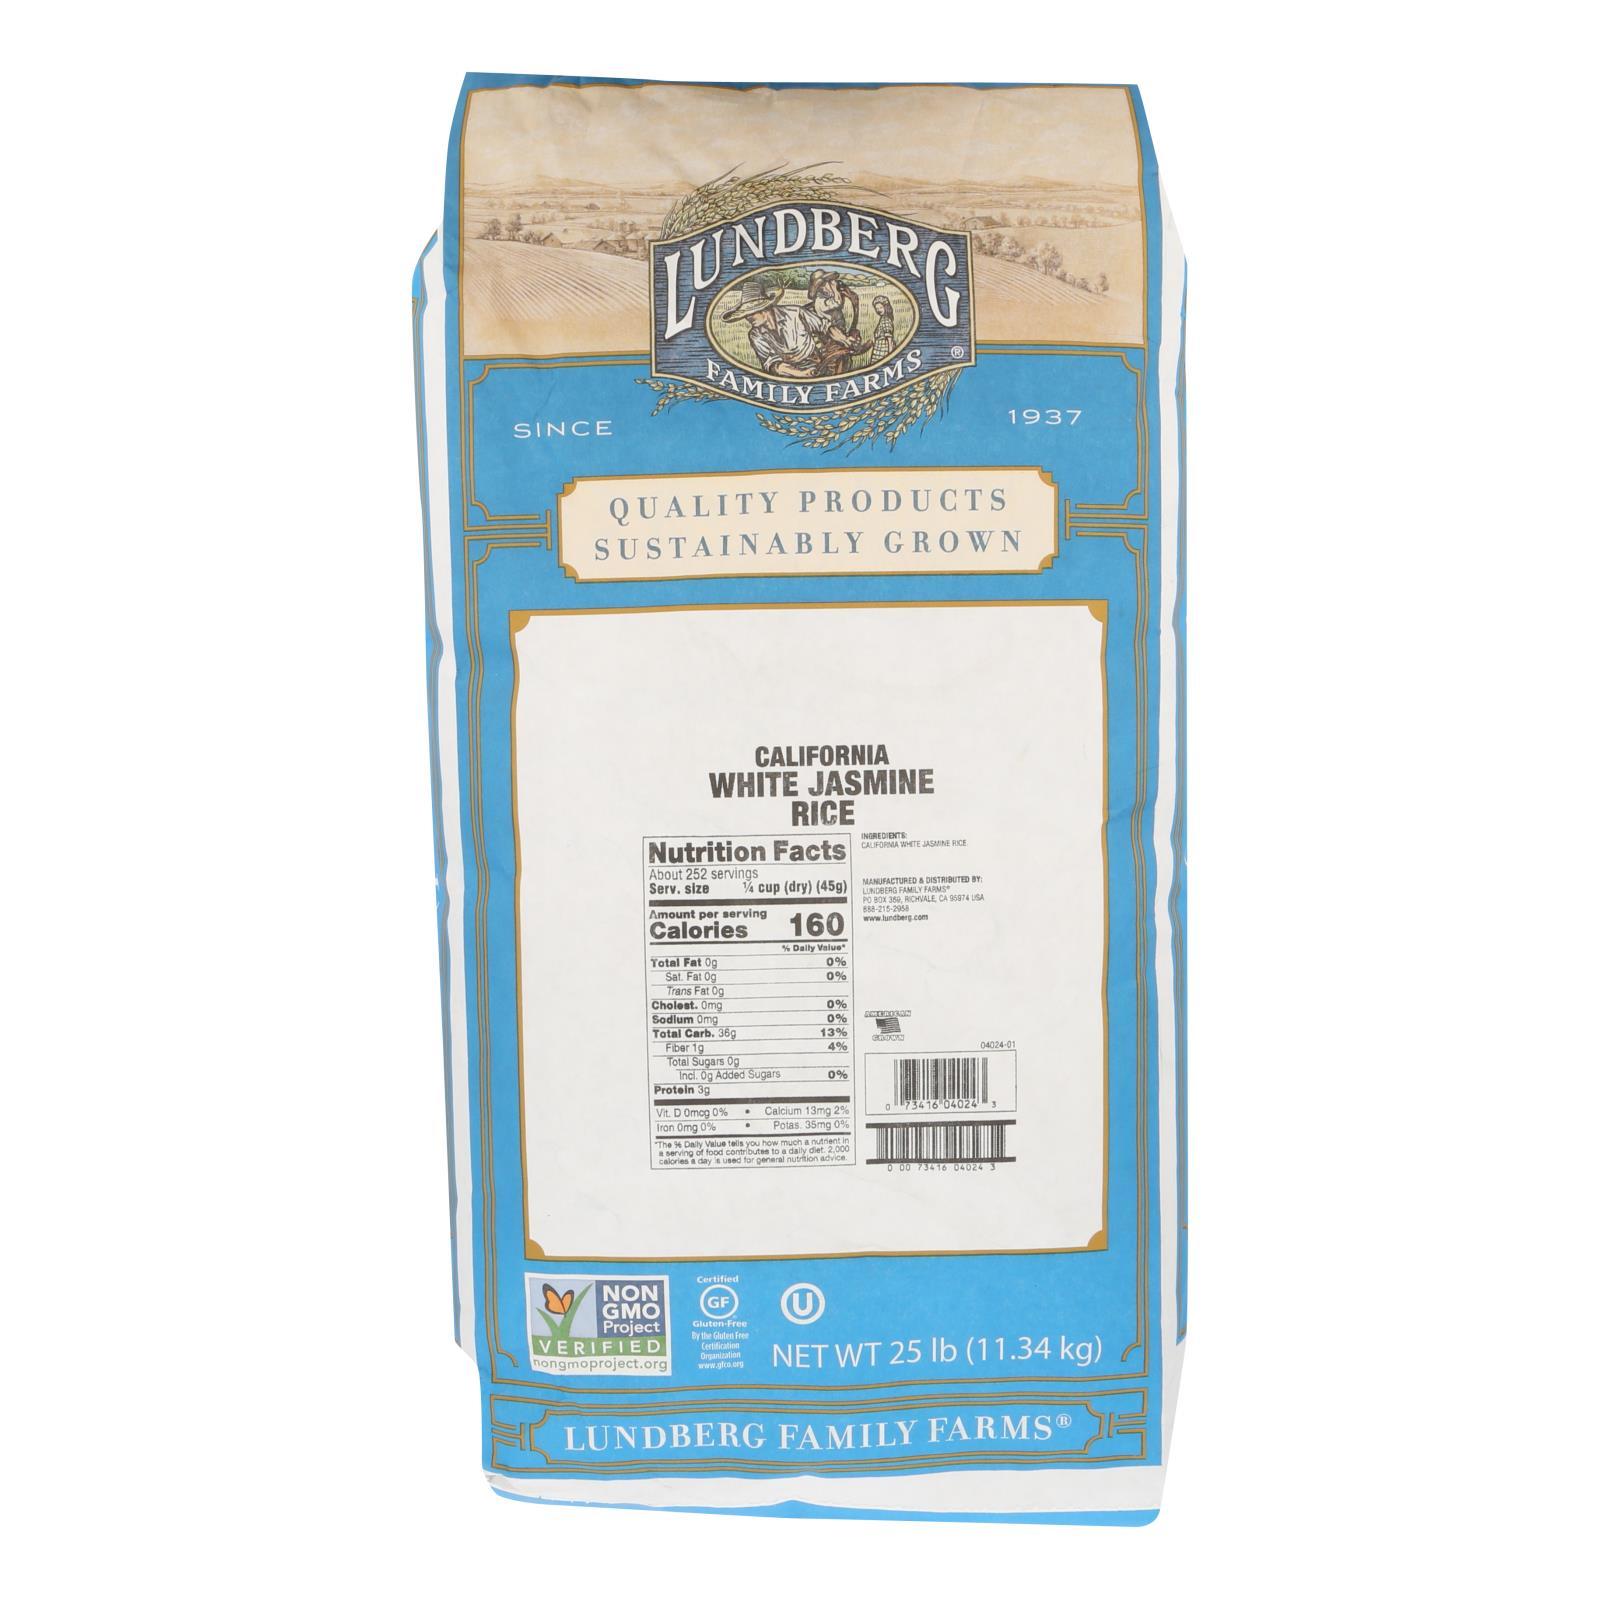 Lundberg Family Farms Eco-Farmed Rice - Jasmine White - 25 lb. %count(alt)